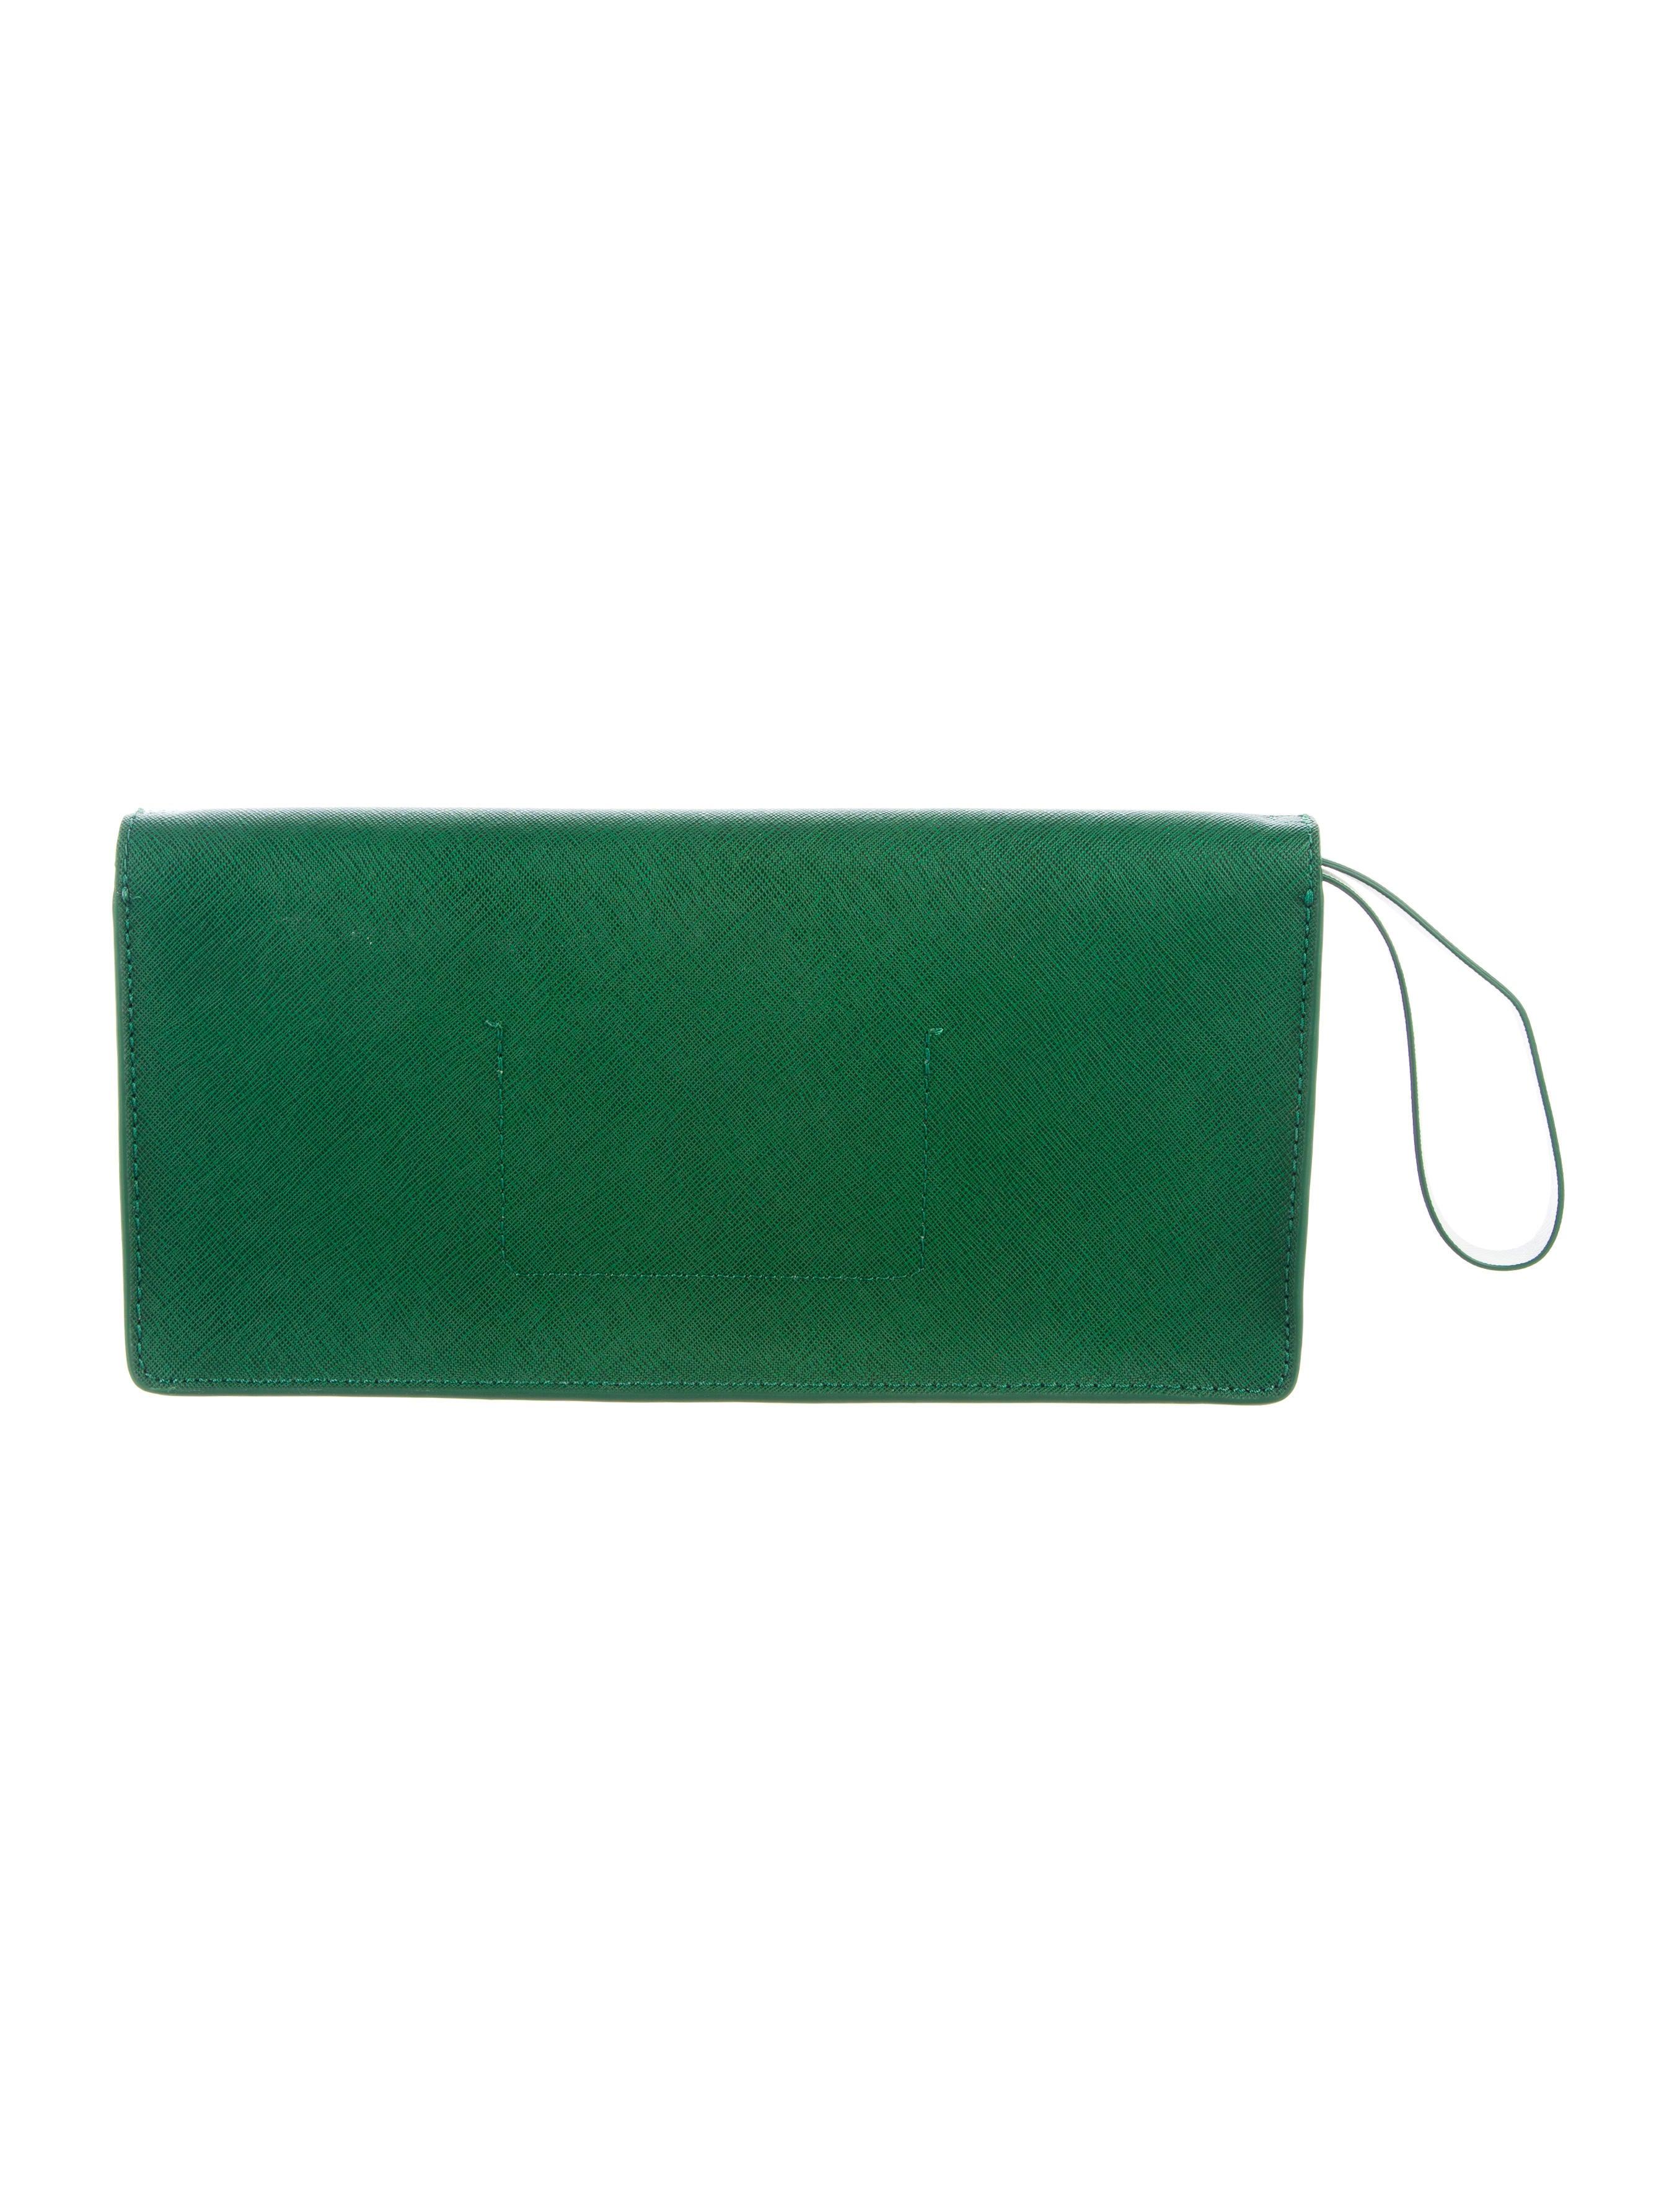 Kate Spade New York Lily Avenue Kiki Clutch Handbags  : WKA655364enlarged from www.therealreal.com size 2706 x 3570 jpeg 582kB